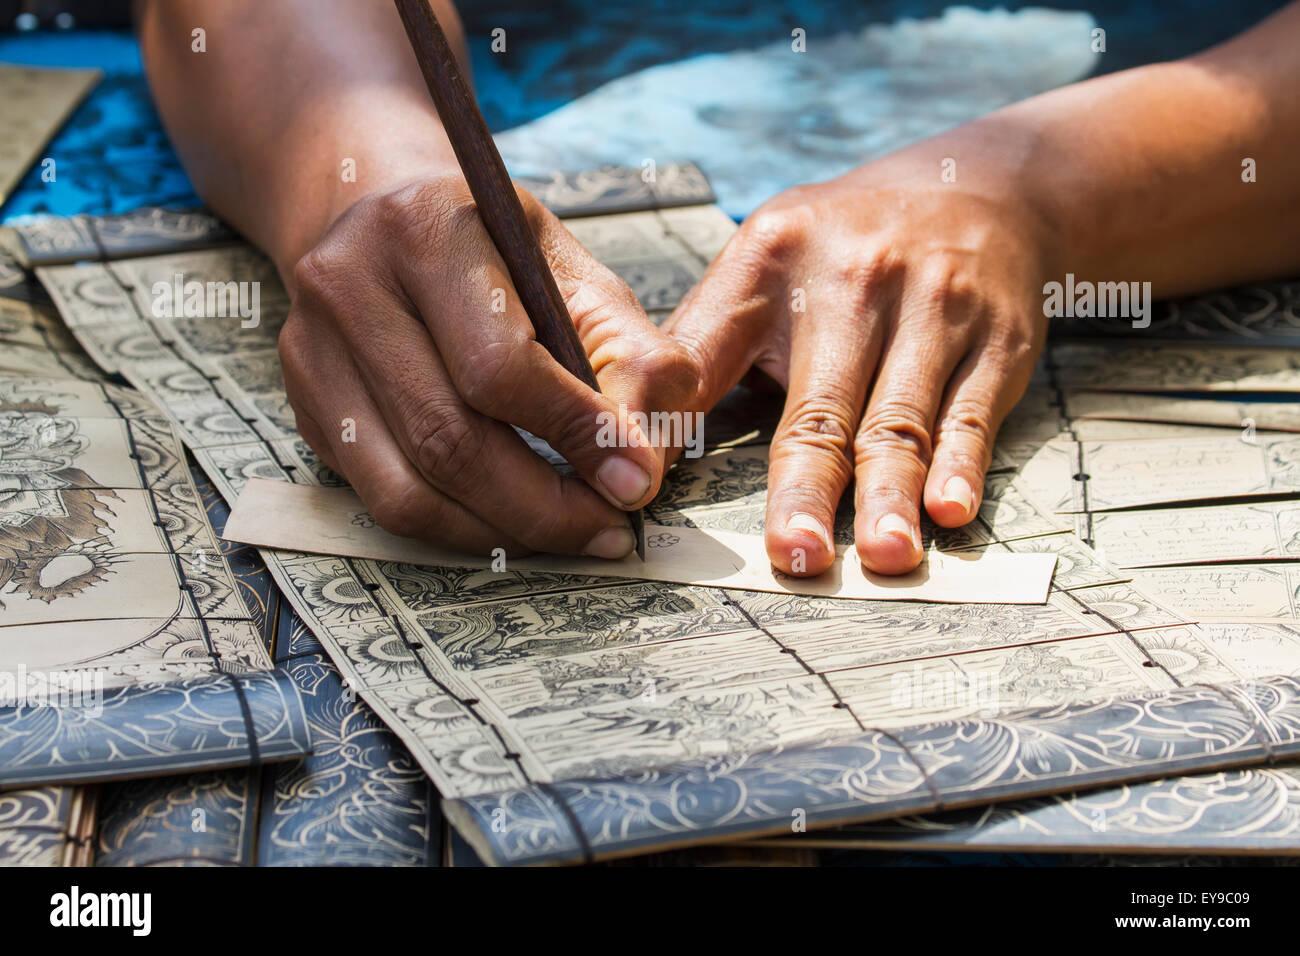 L'uomo carving gli antichi racconti in sanscrito lontar sulle foglie, Tenganan Pegringsingan, Bali, Indonesia Immagini Stock